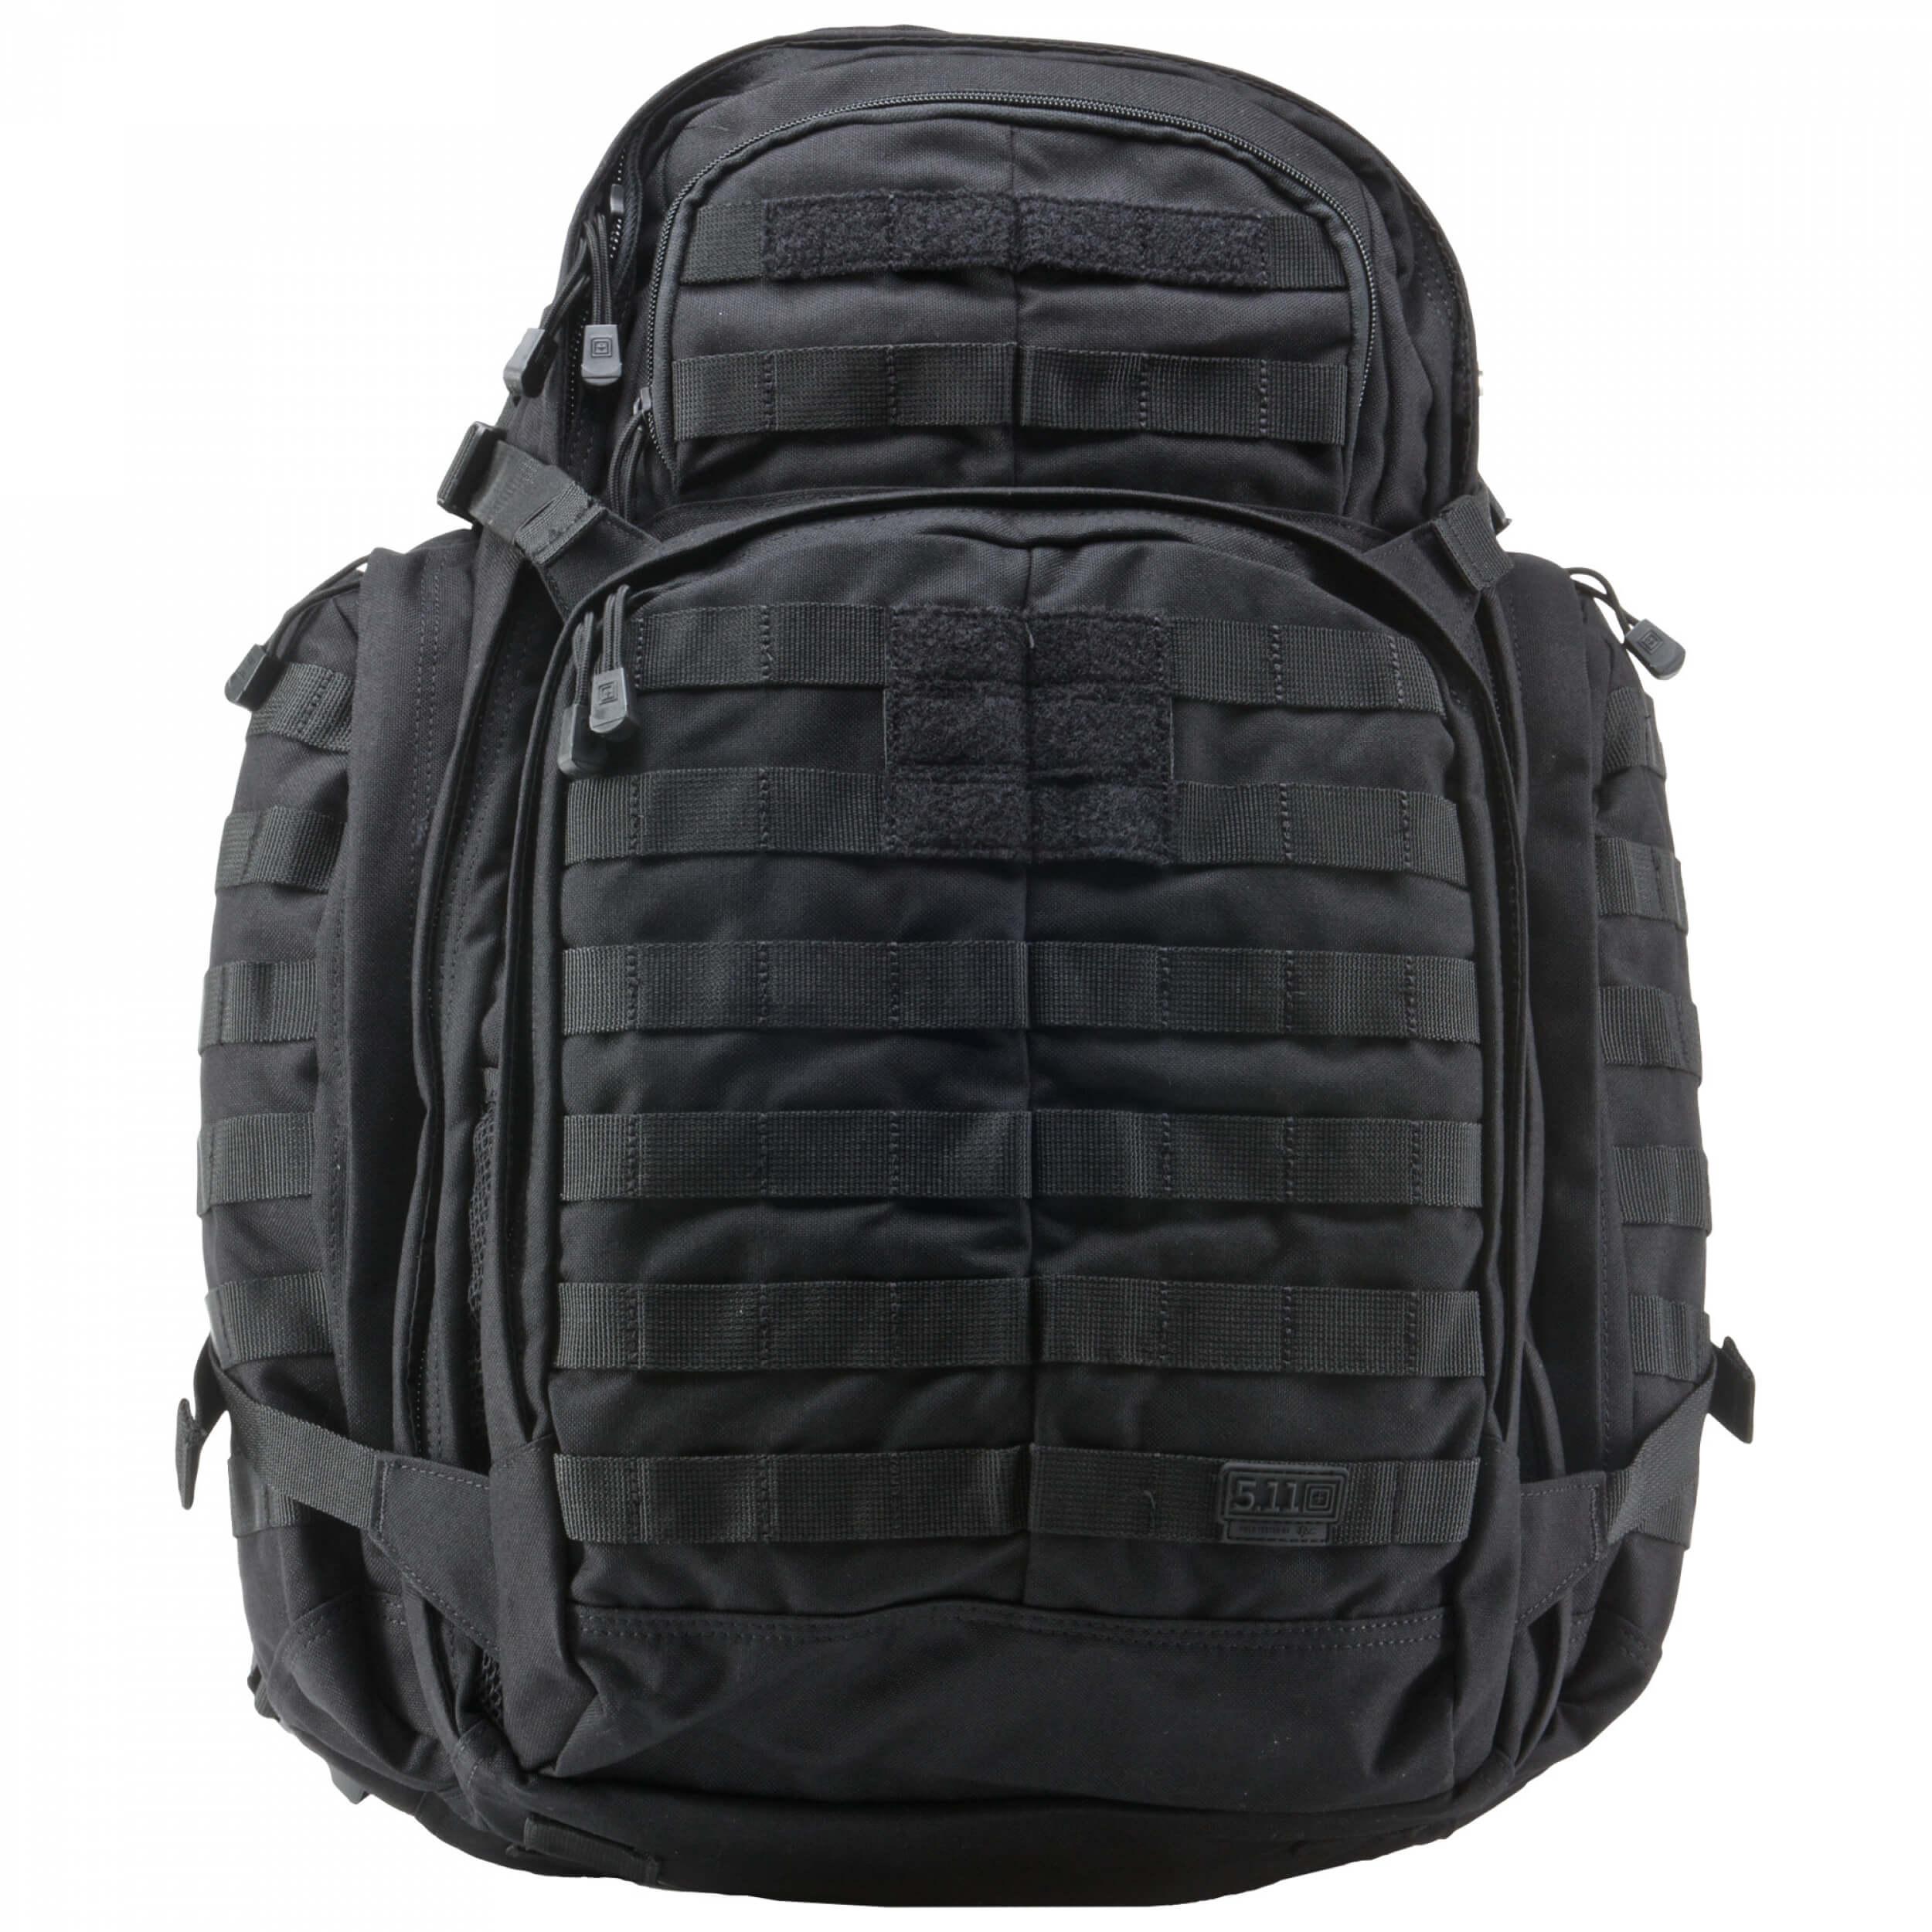 5.11 Tactical Rush 72 Backpack Schwarz